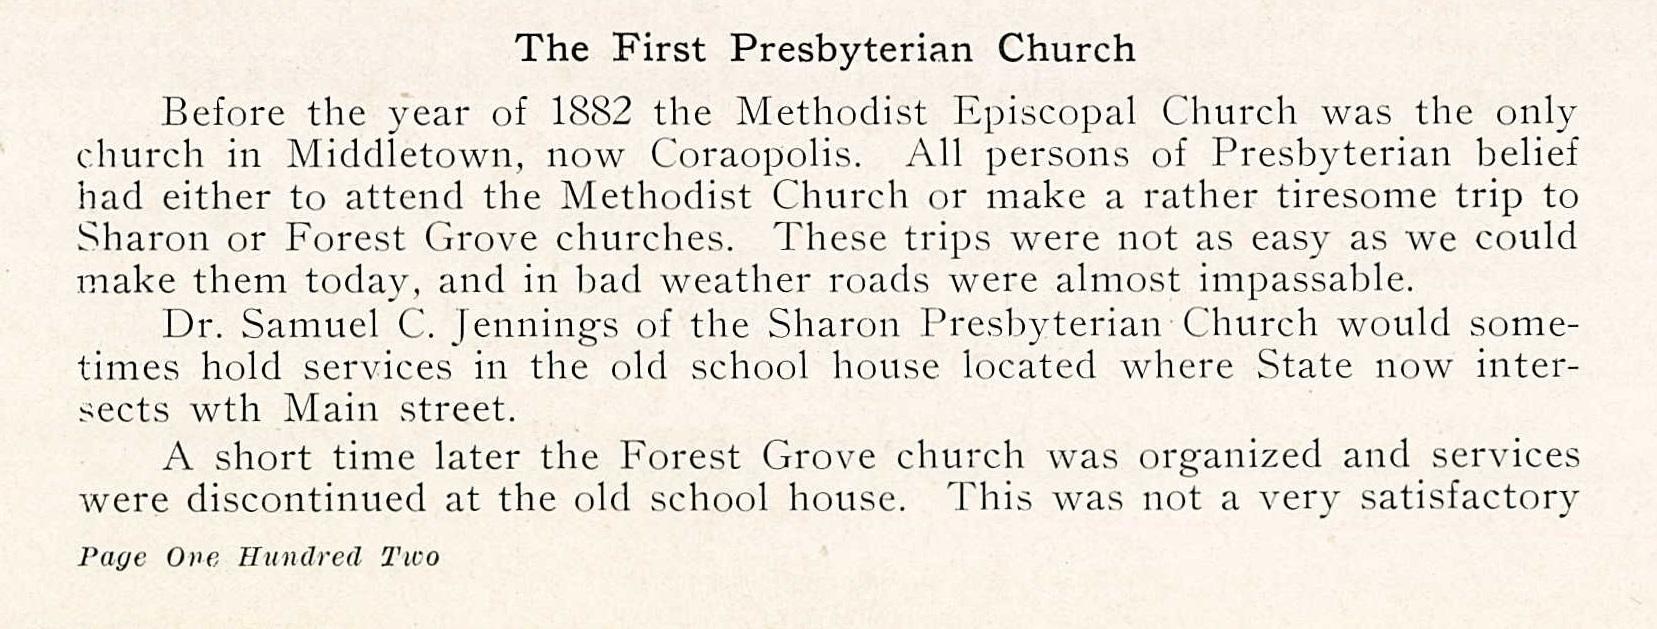 The First Presbyterian Church - 1924 Coraopolis HS Review (102).jpg